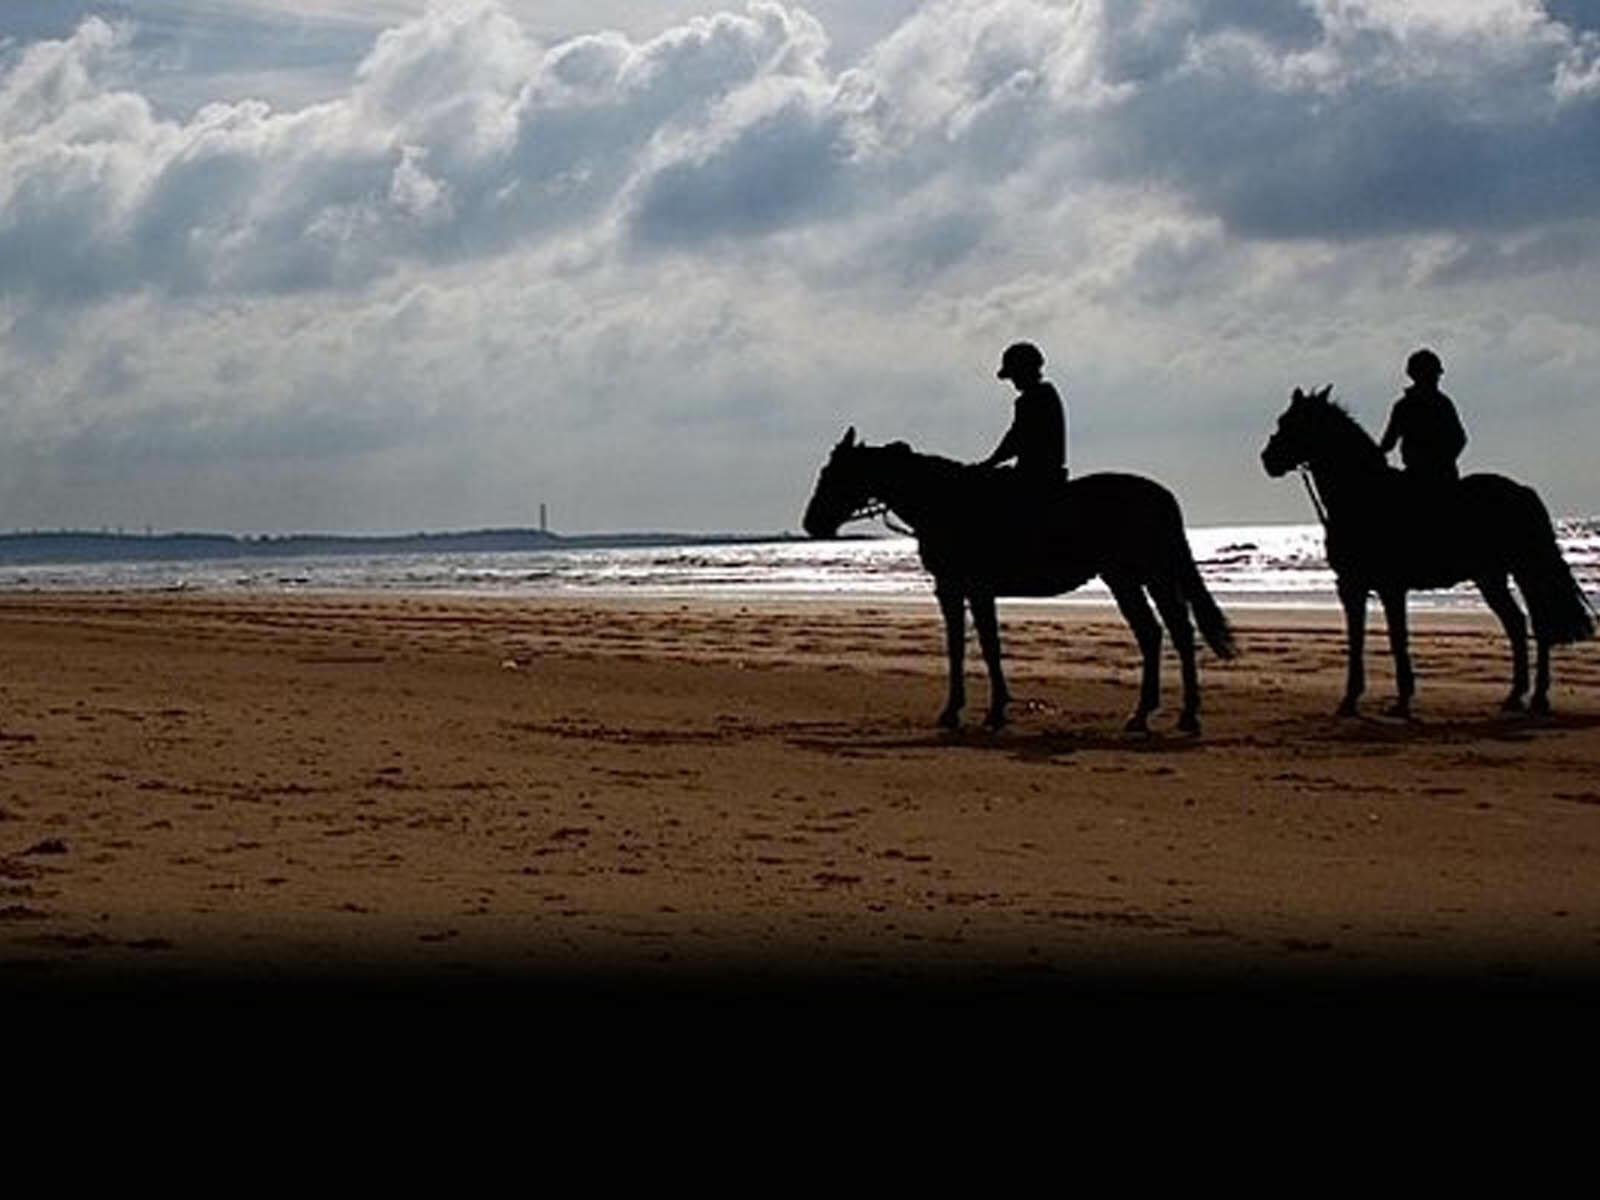 Two men on horses at the sea shore near Hotel Cascais Miragem